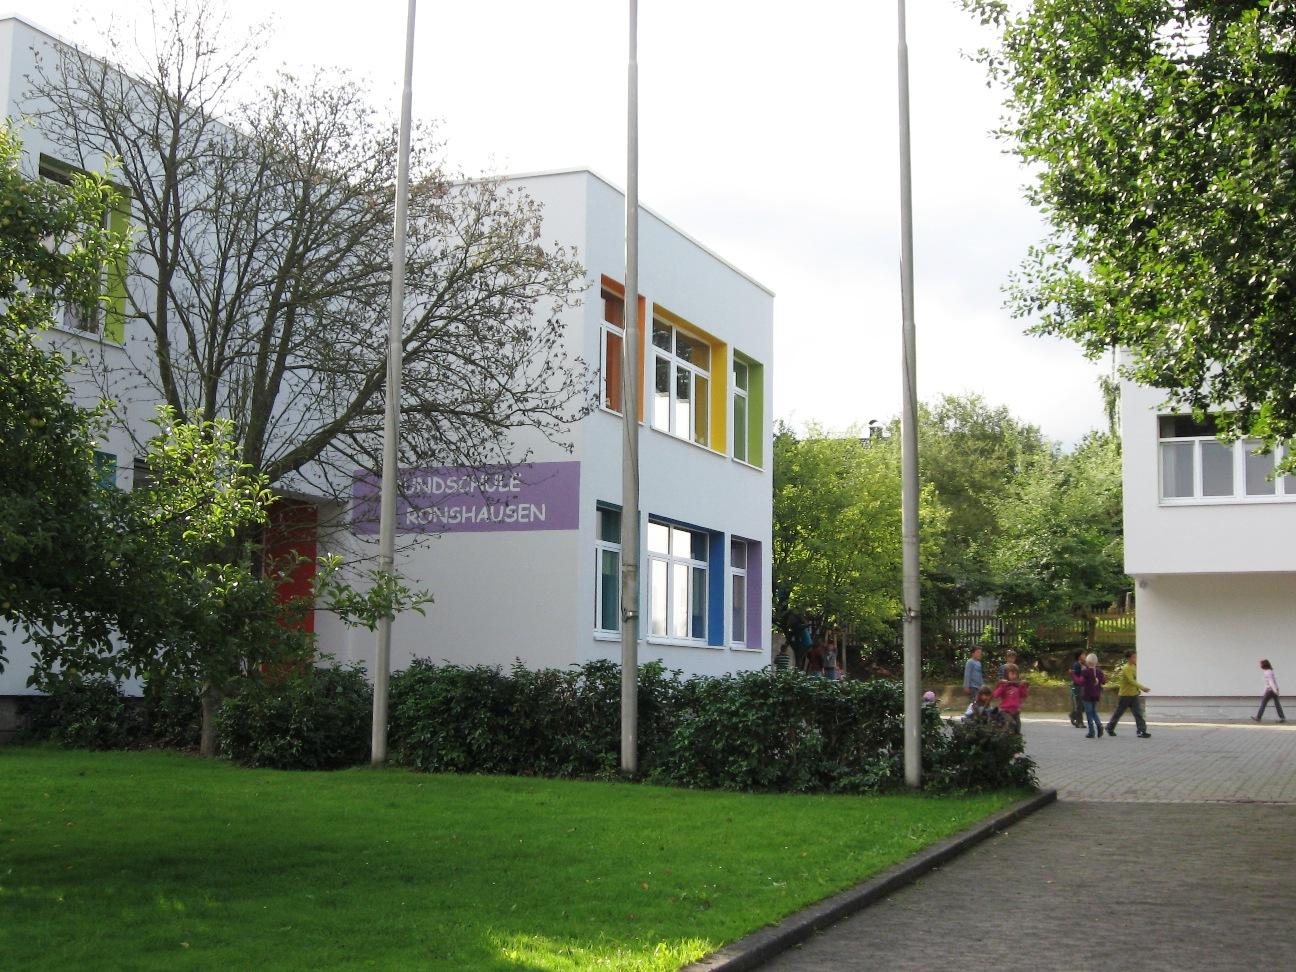 Grundschule Ronshausen